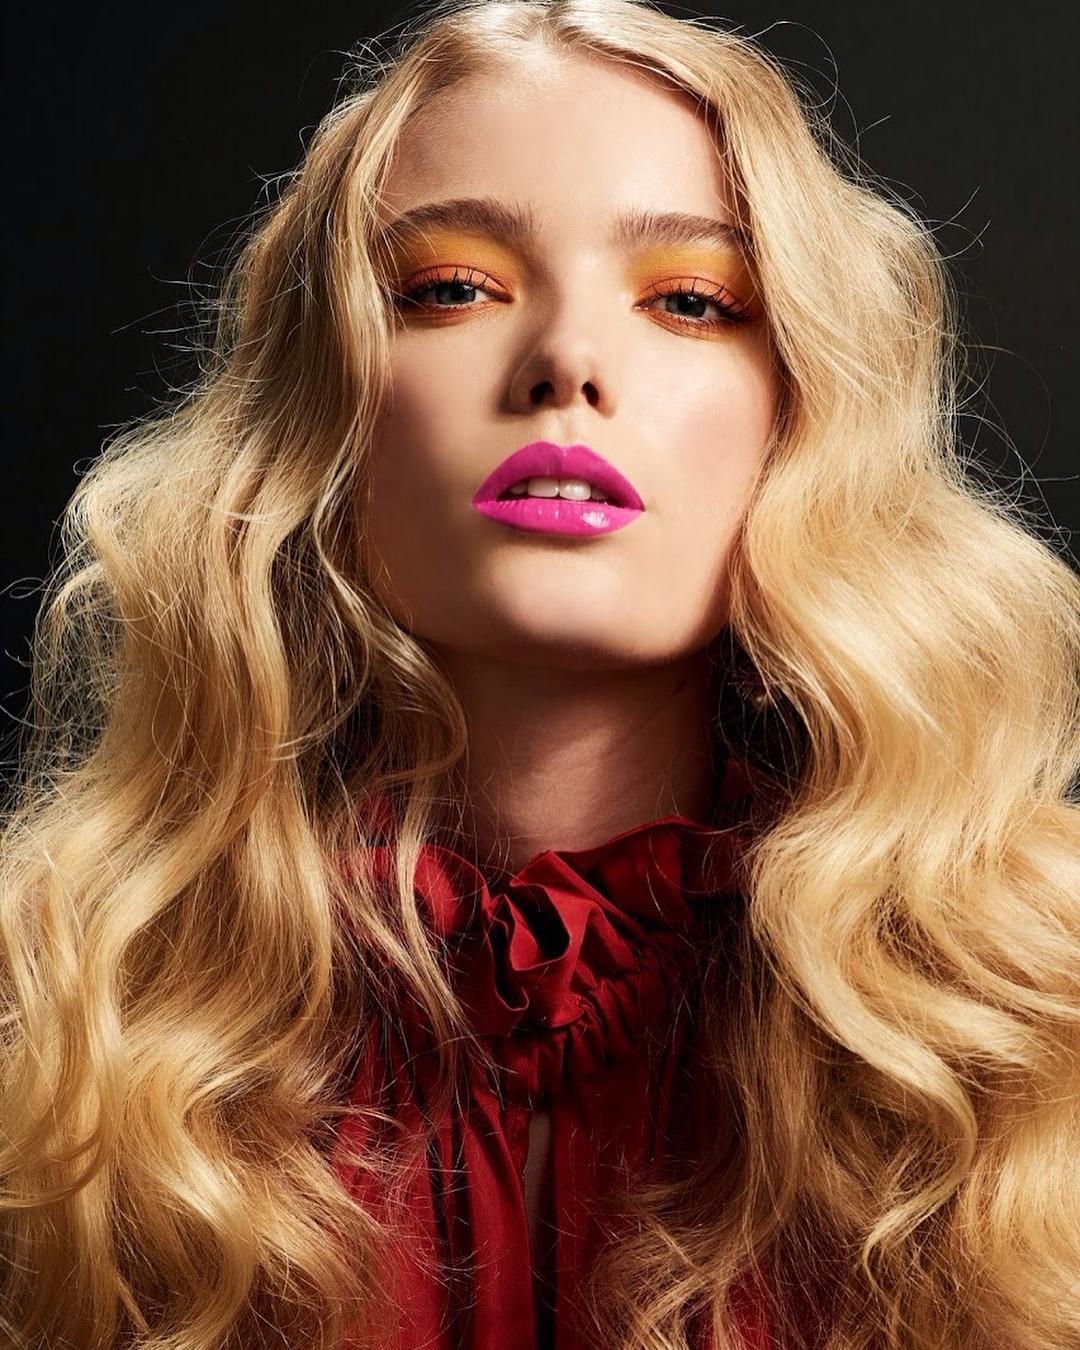 Charlotte photographed by Karen Ishiguro @ishigurokaren for REMIX MAGAZINE;  Makeup: Kiekie Stanners@kiekies__ ; Hair: Sara Allsop @ Dharma Salon  @saraallsop